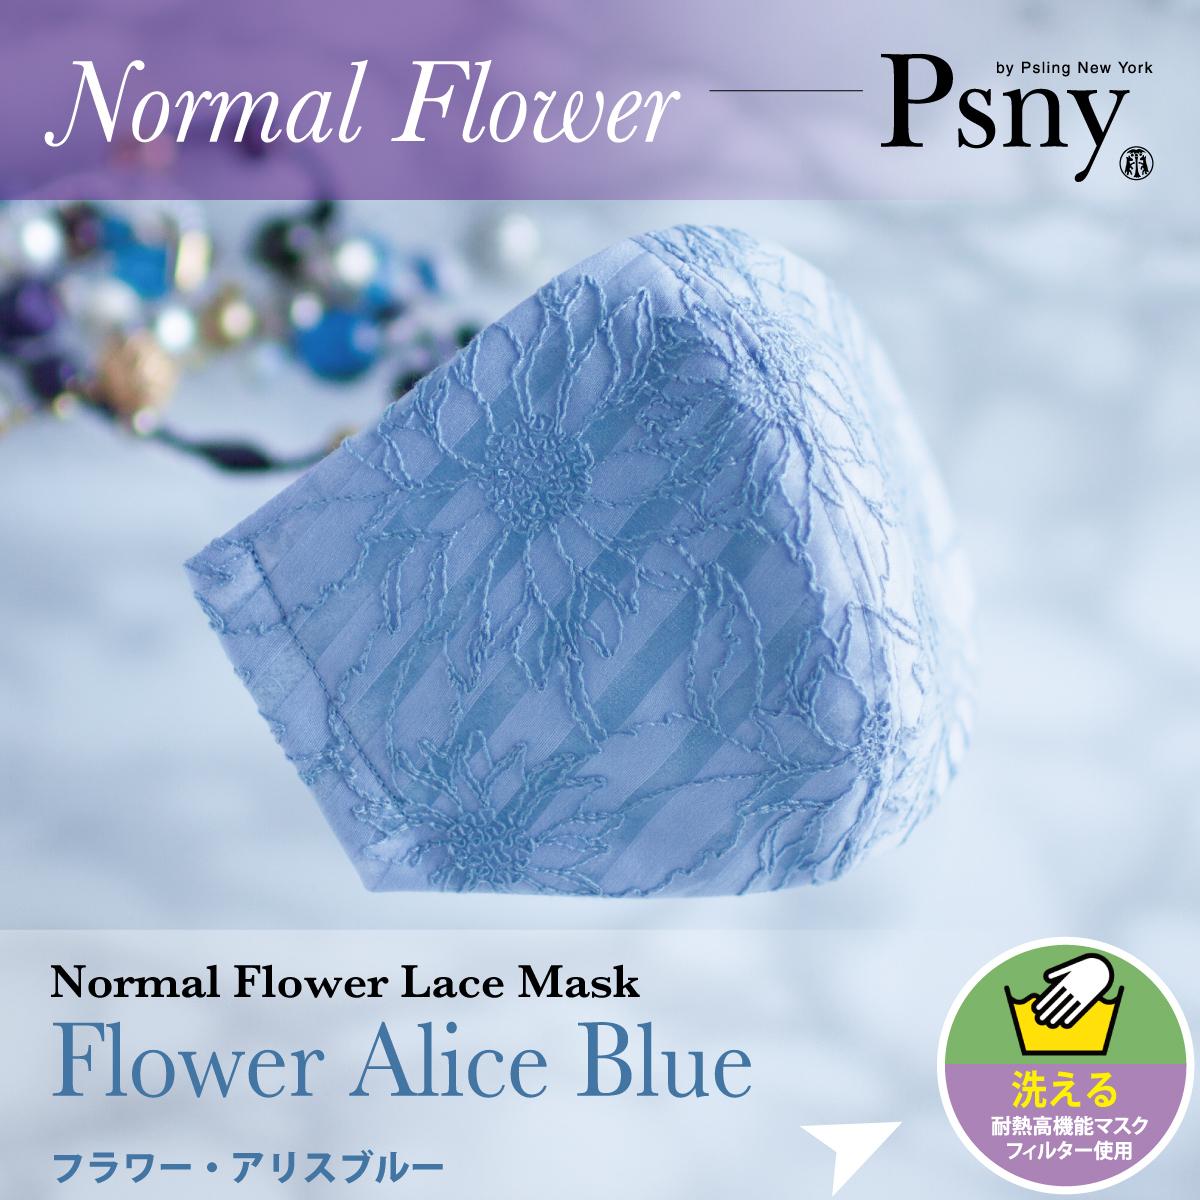 PSNY レース・フラワー・アリスブルー 花粉 黄砂 フィルター入り 立体 マスク 大人用 ブルー レースマスク